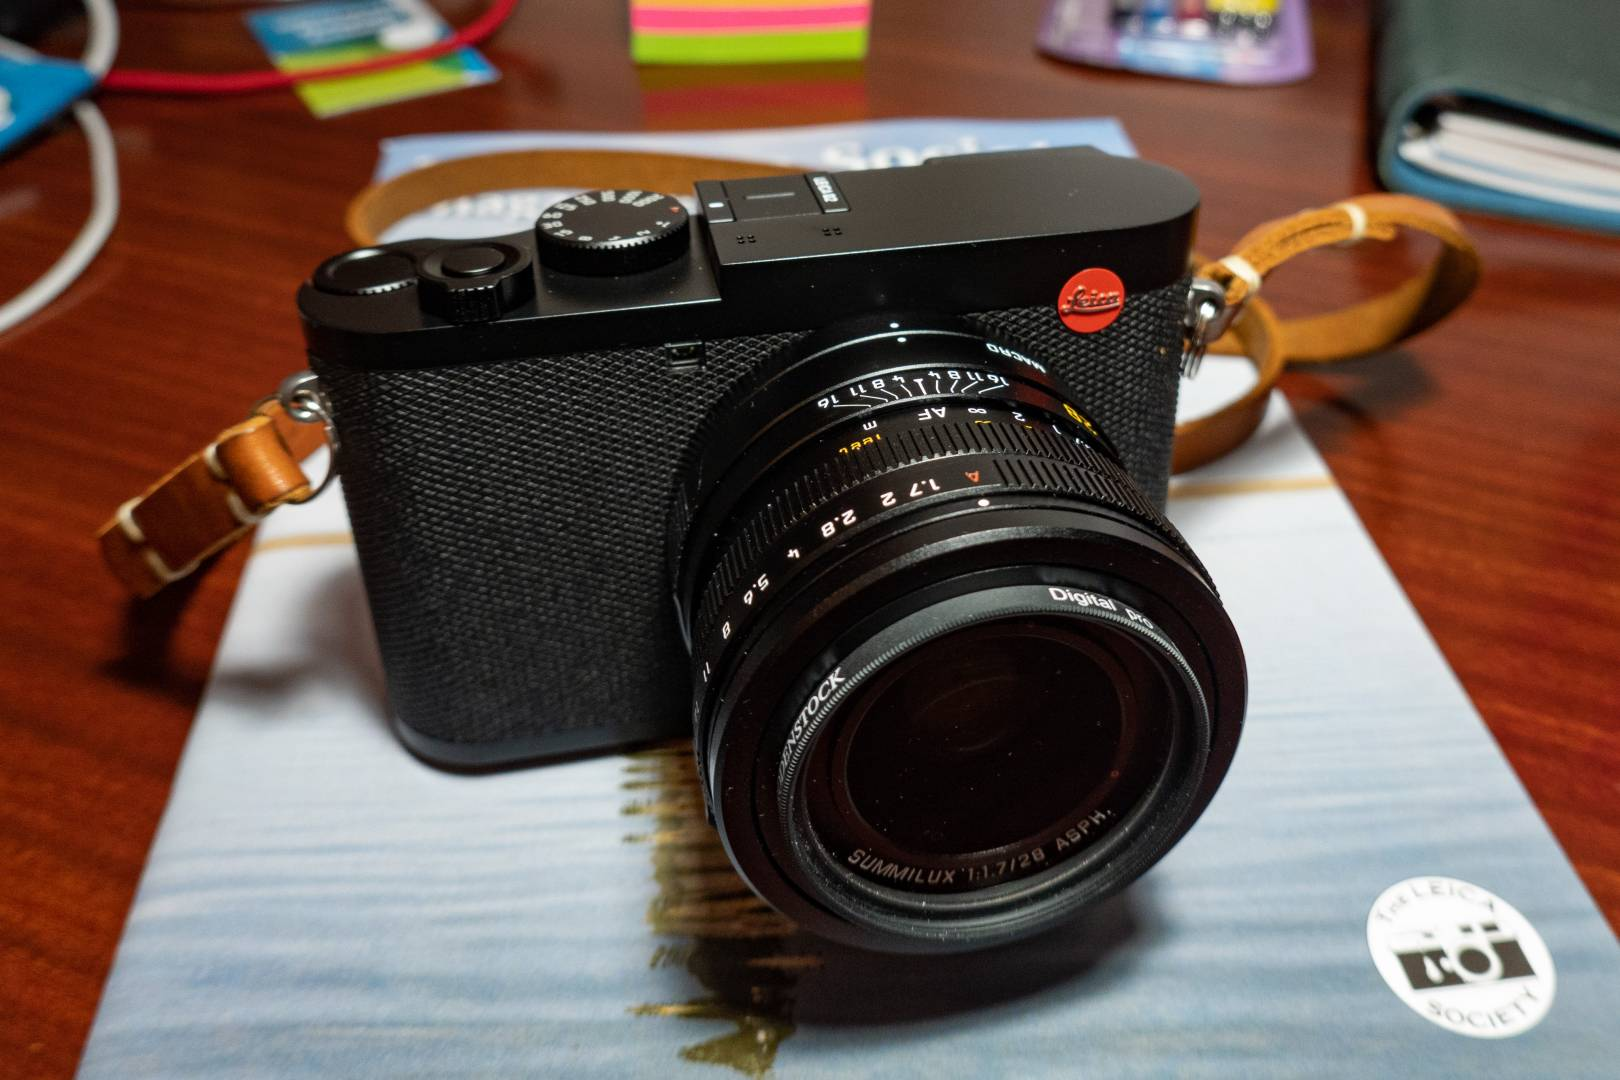 Leica Q2 arrives at Macfilos - Macfilos